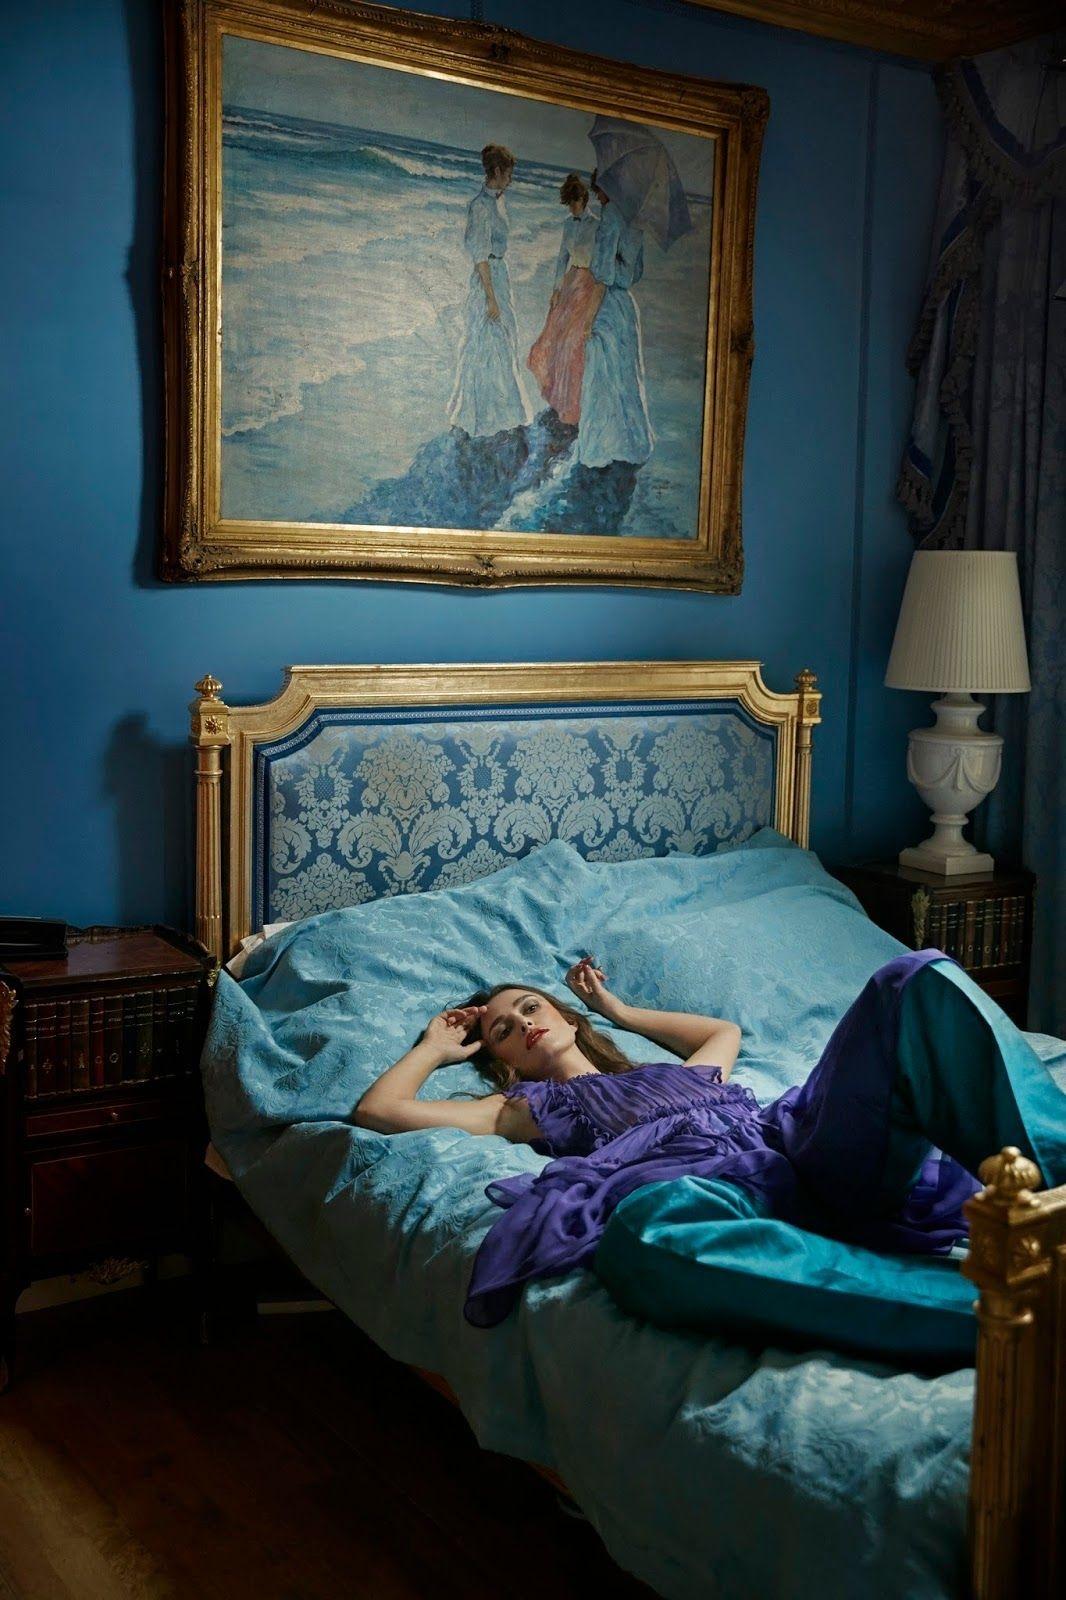 #home#interior#keira knightley#Bed#bedroom#blue